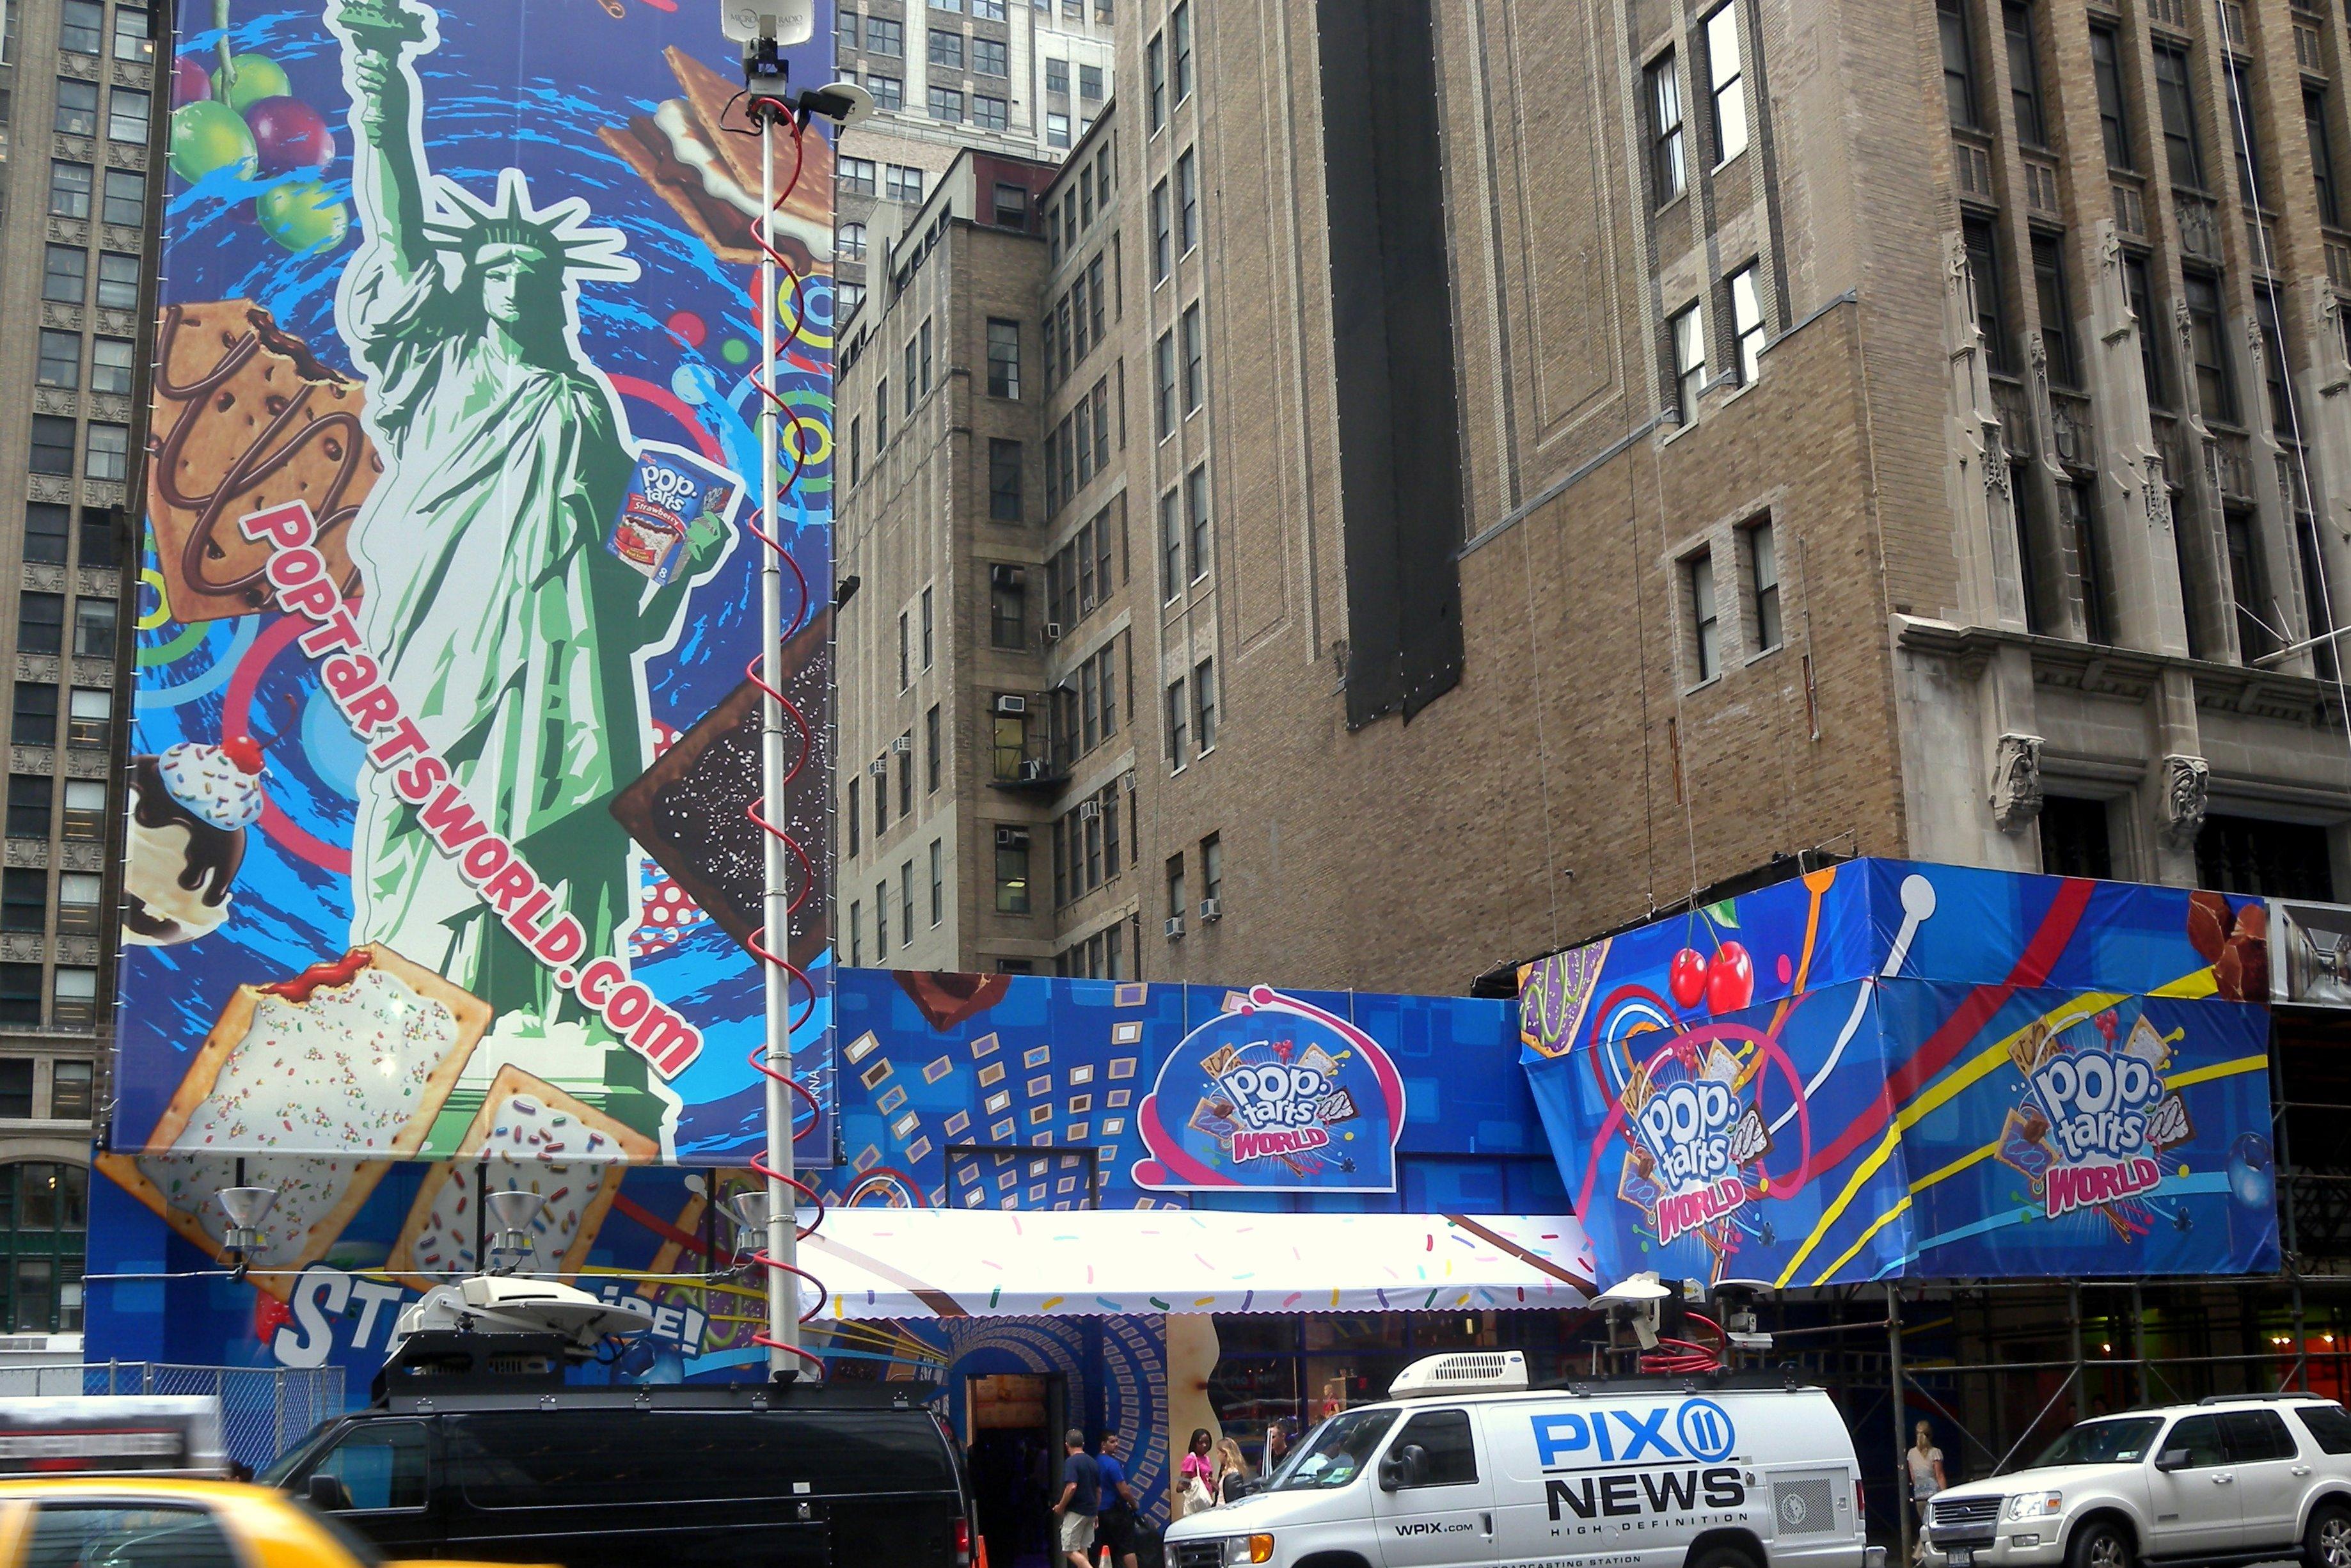 Pop-Tarts World, New York